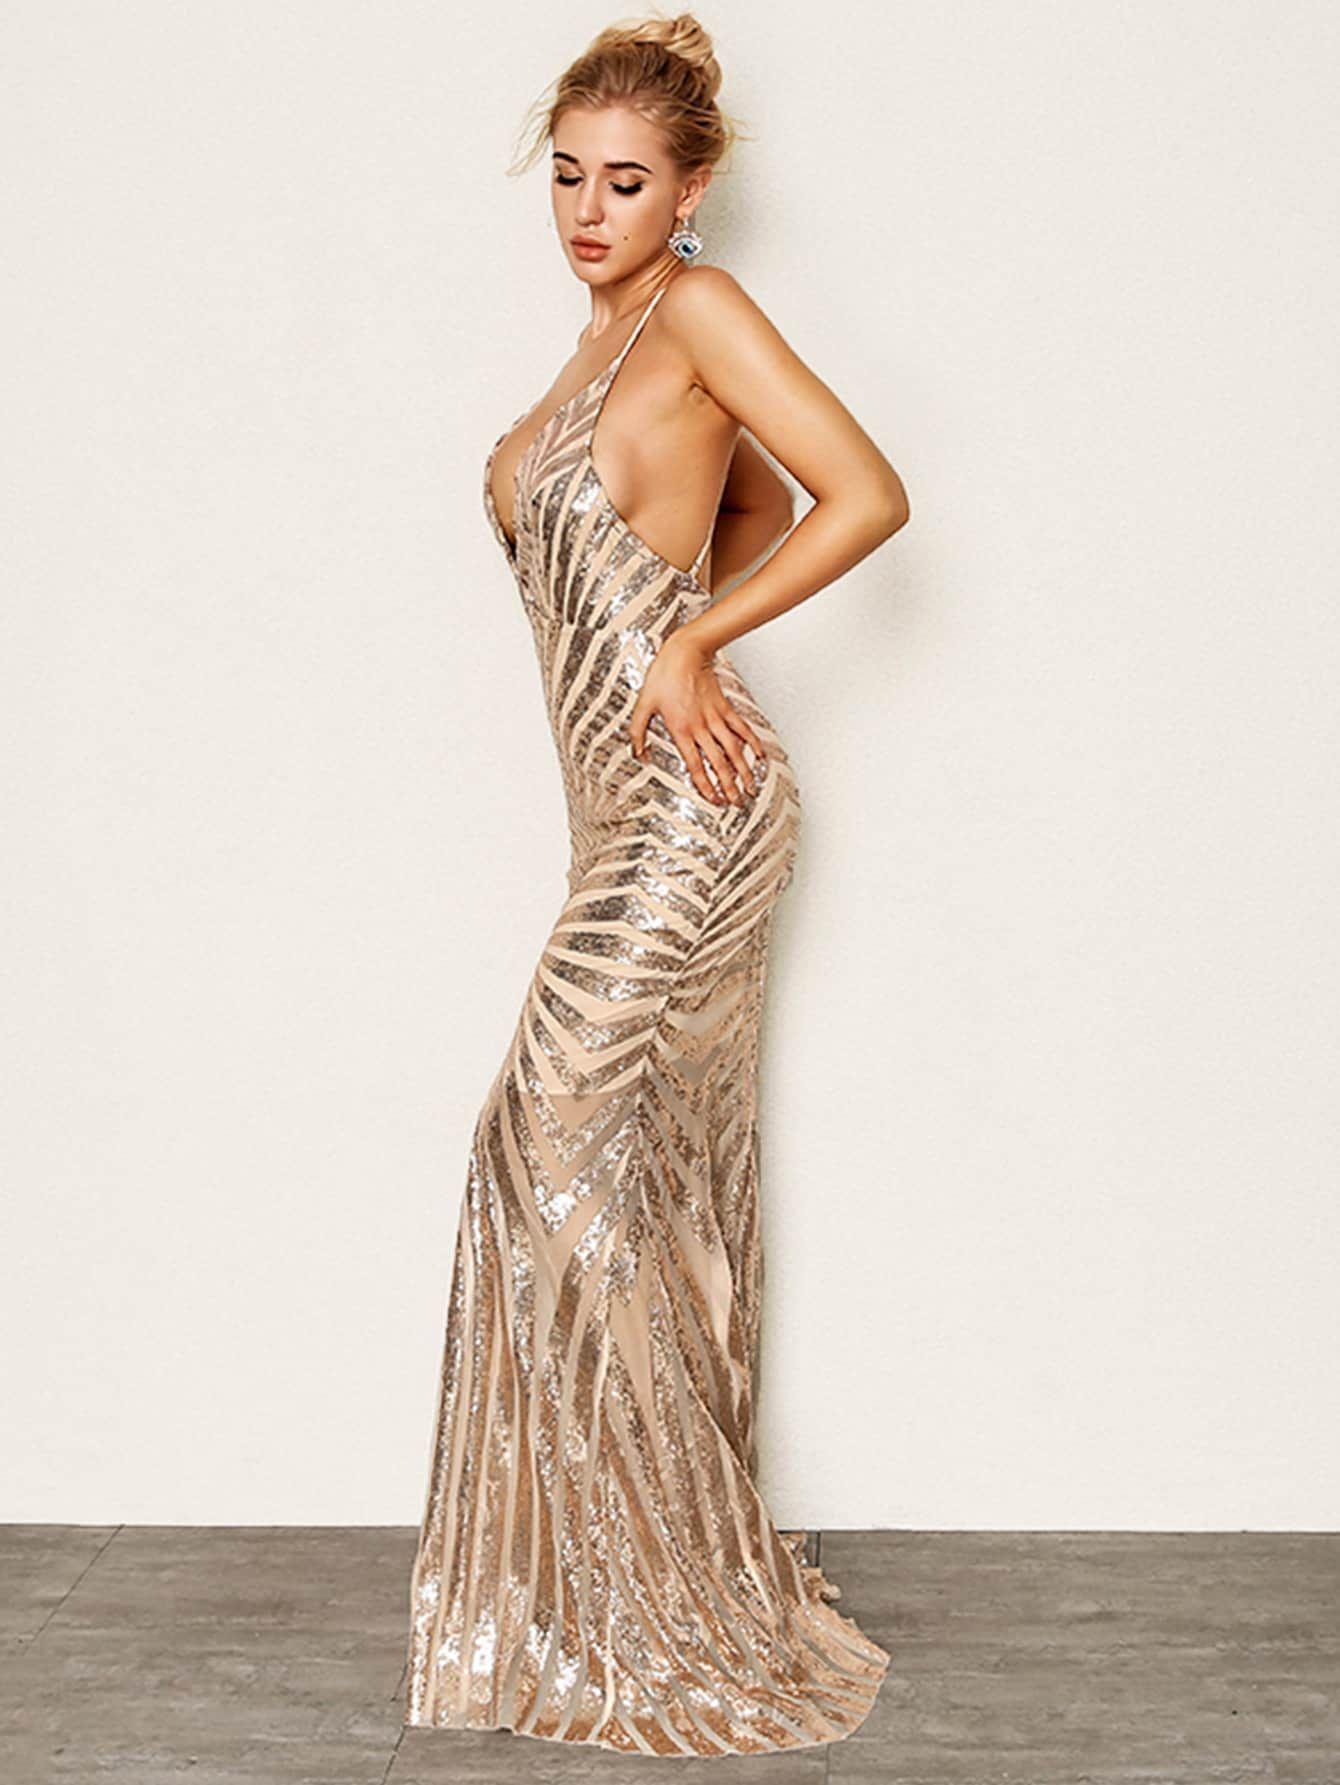 e002aaa73a0 Joyfunear Crisscross Open Back Fishtail Metallic Sequin Dress  Open#Crisscross#Joyfunear